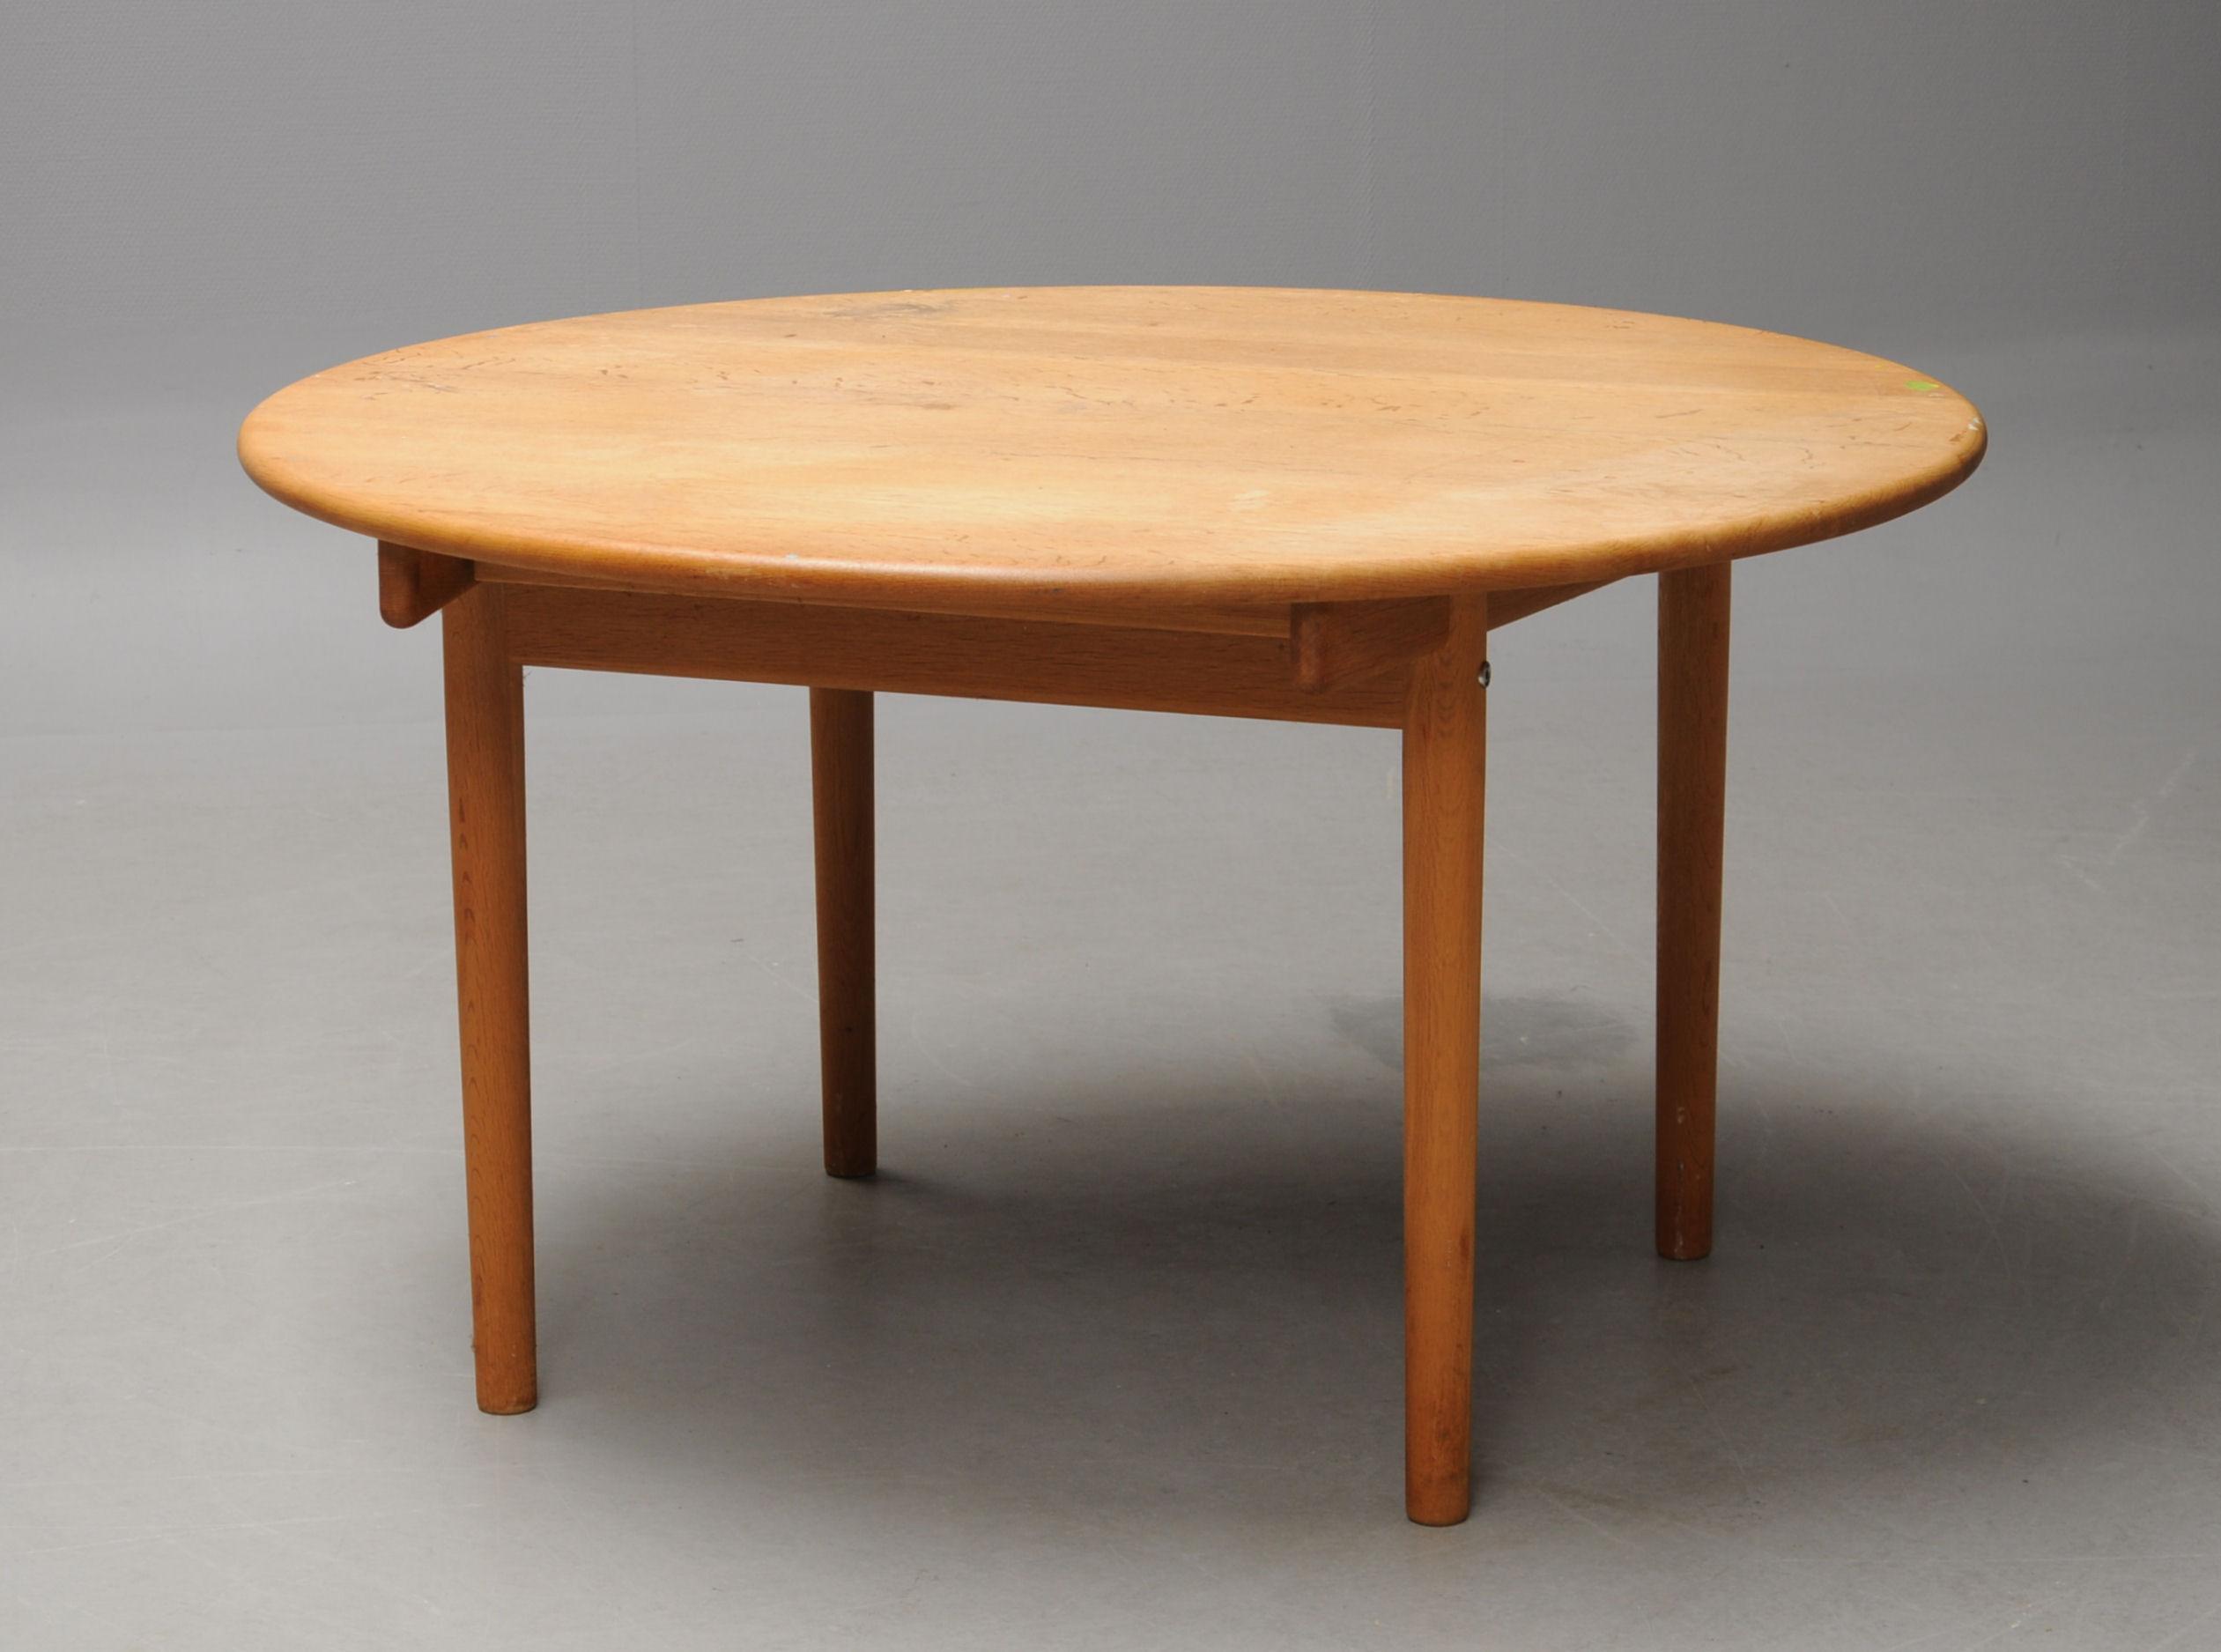 Hans J. Wegner. Round oak dining table, model PP 9 9   Lauritz.com